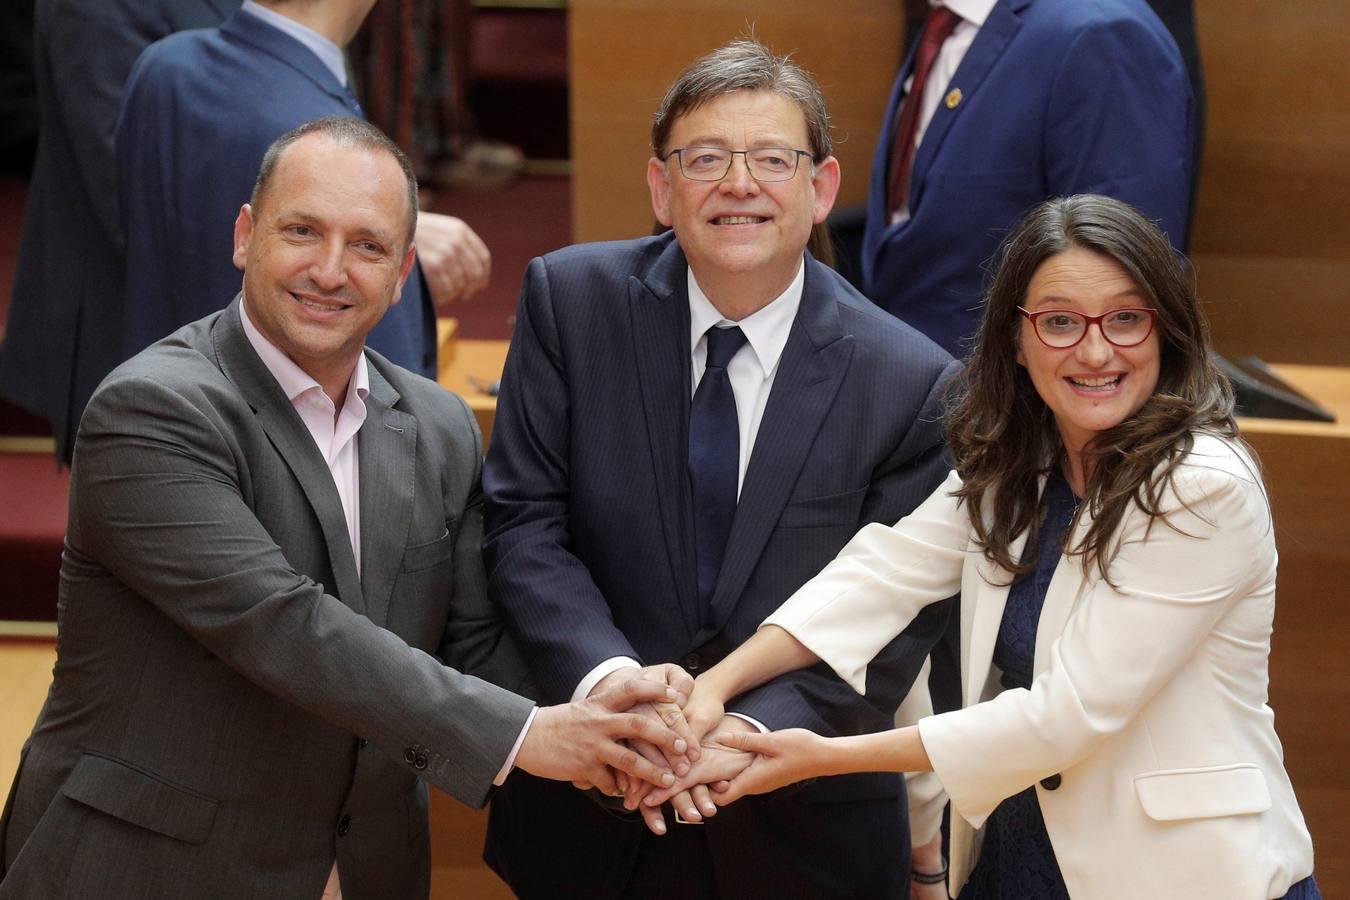 Pleno de investidura de Ximo Puig en Les Corts